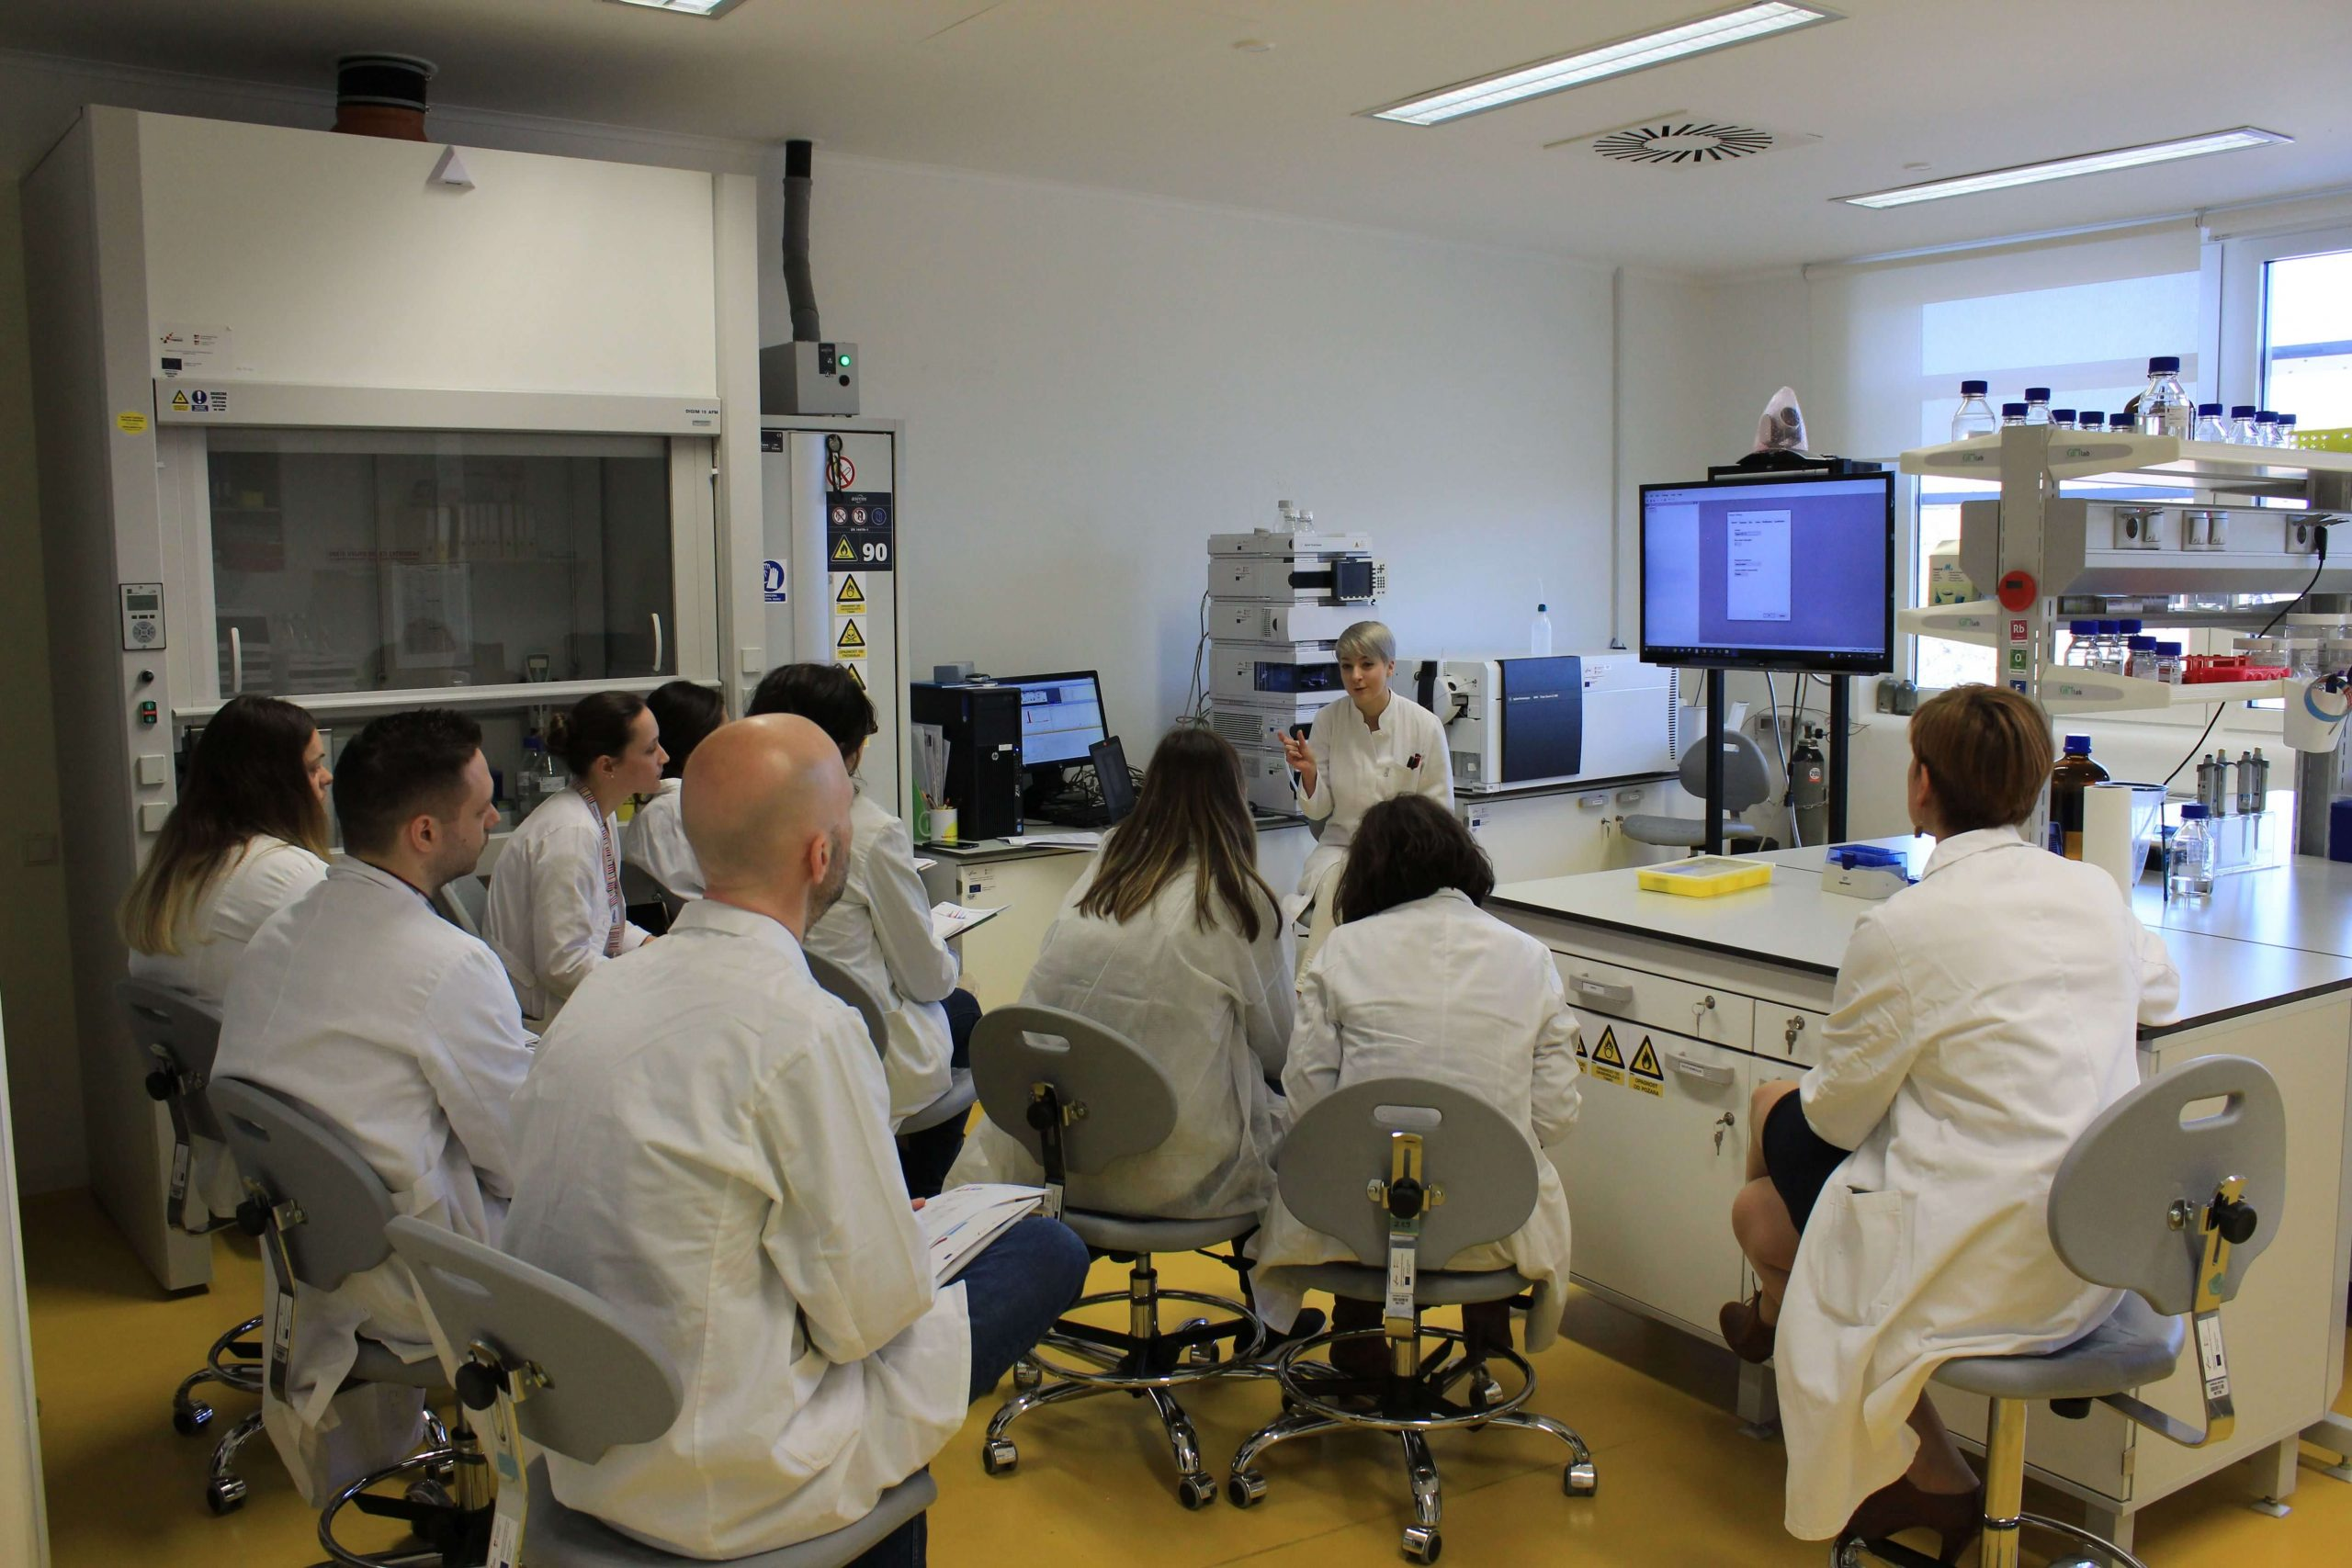 Analiza Identifikacija I Kvantifikacija Proteina 3 Scaled